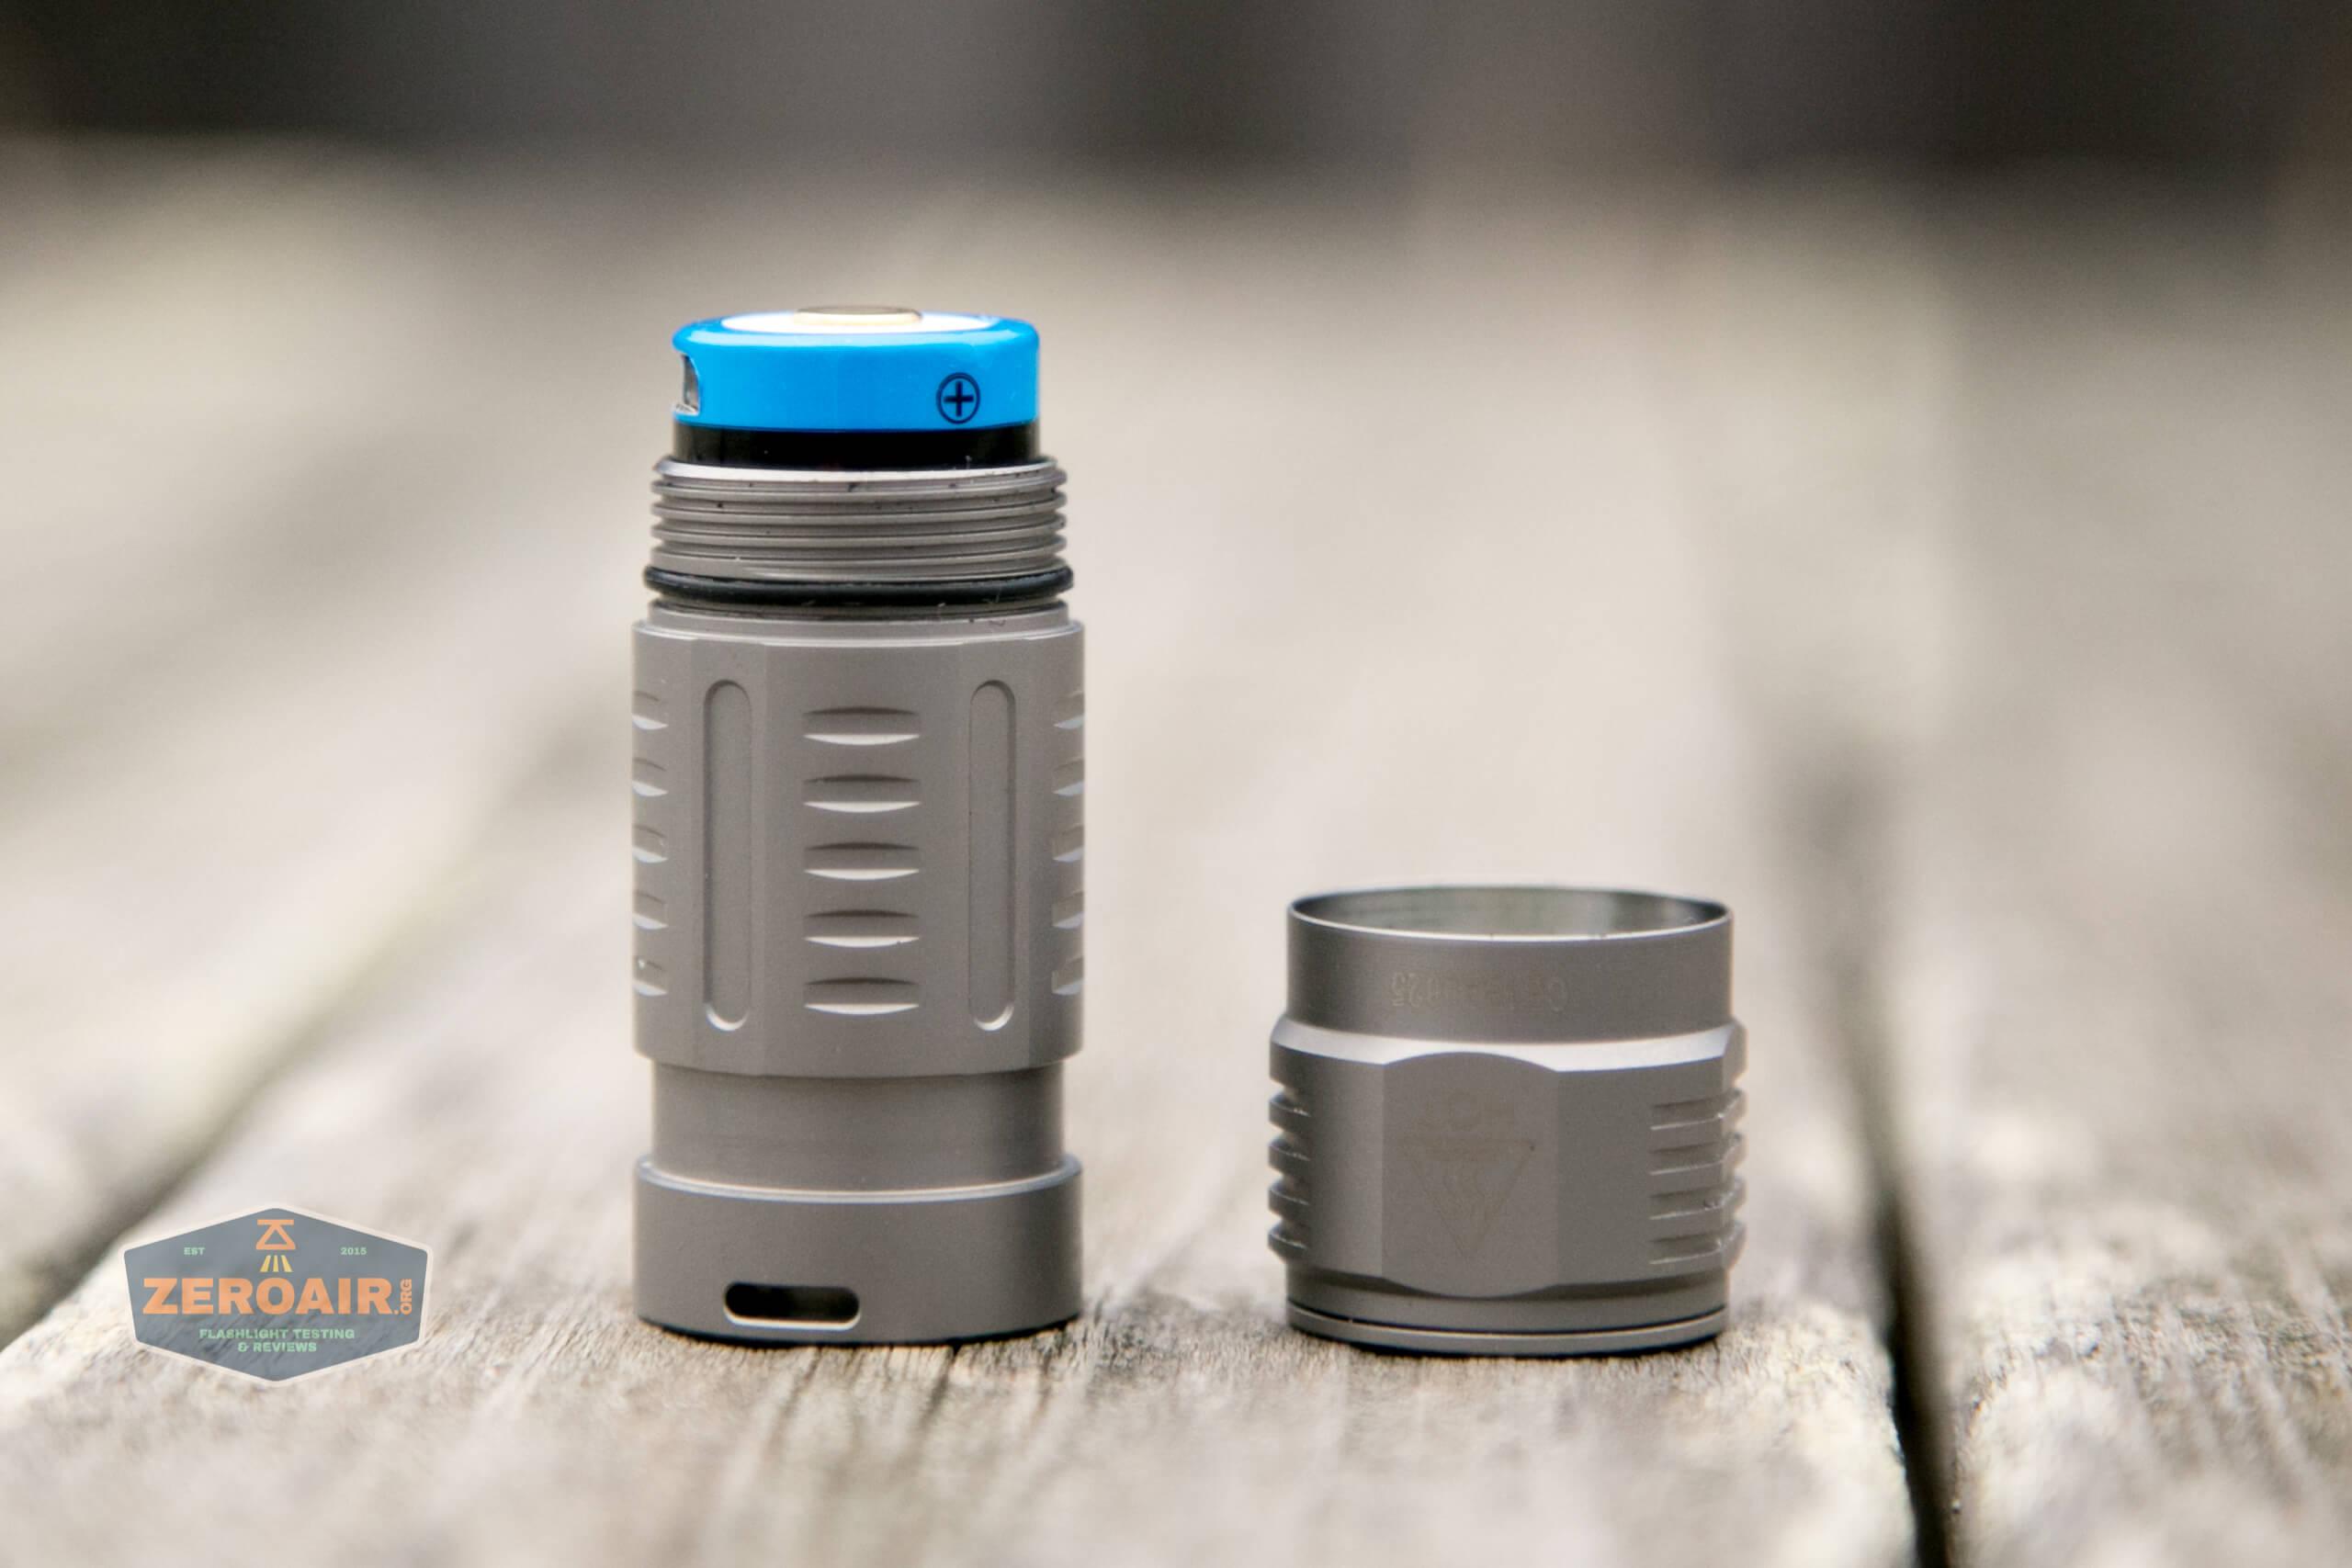 freasygears cyansky m3 titanium pocket flashlight cell installed